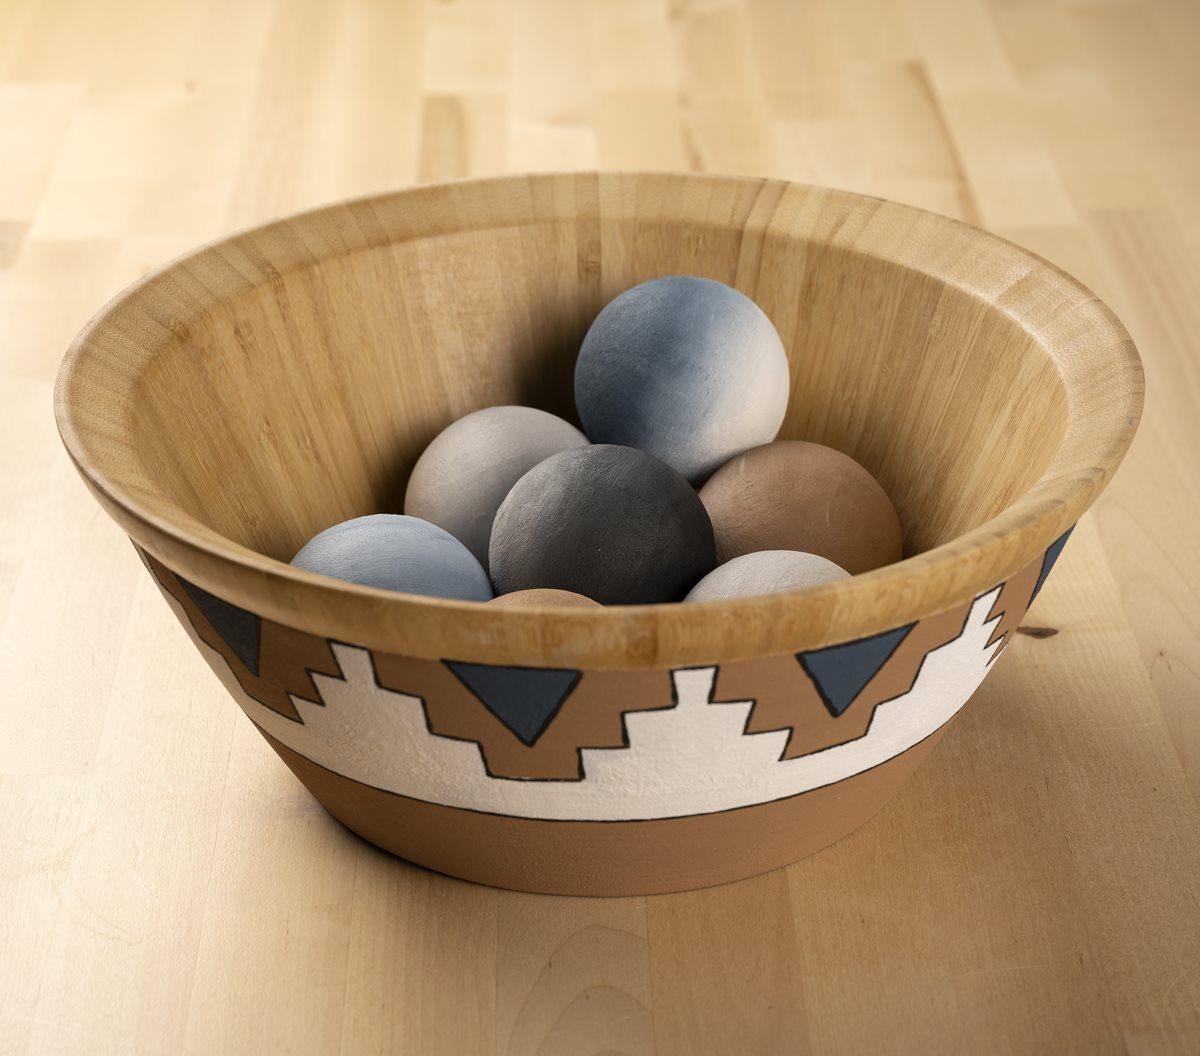 Terra Cotta Wooden Bowl